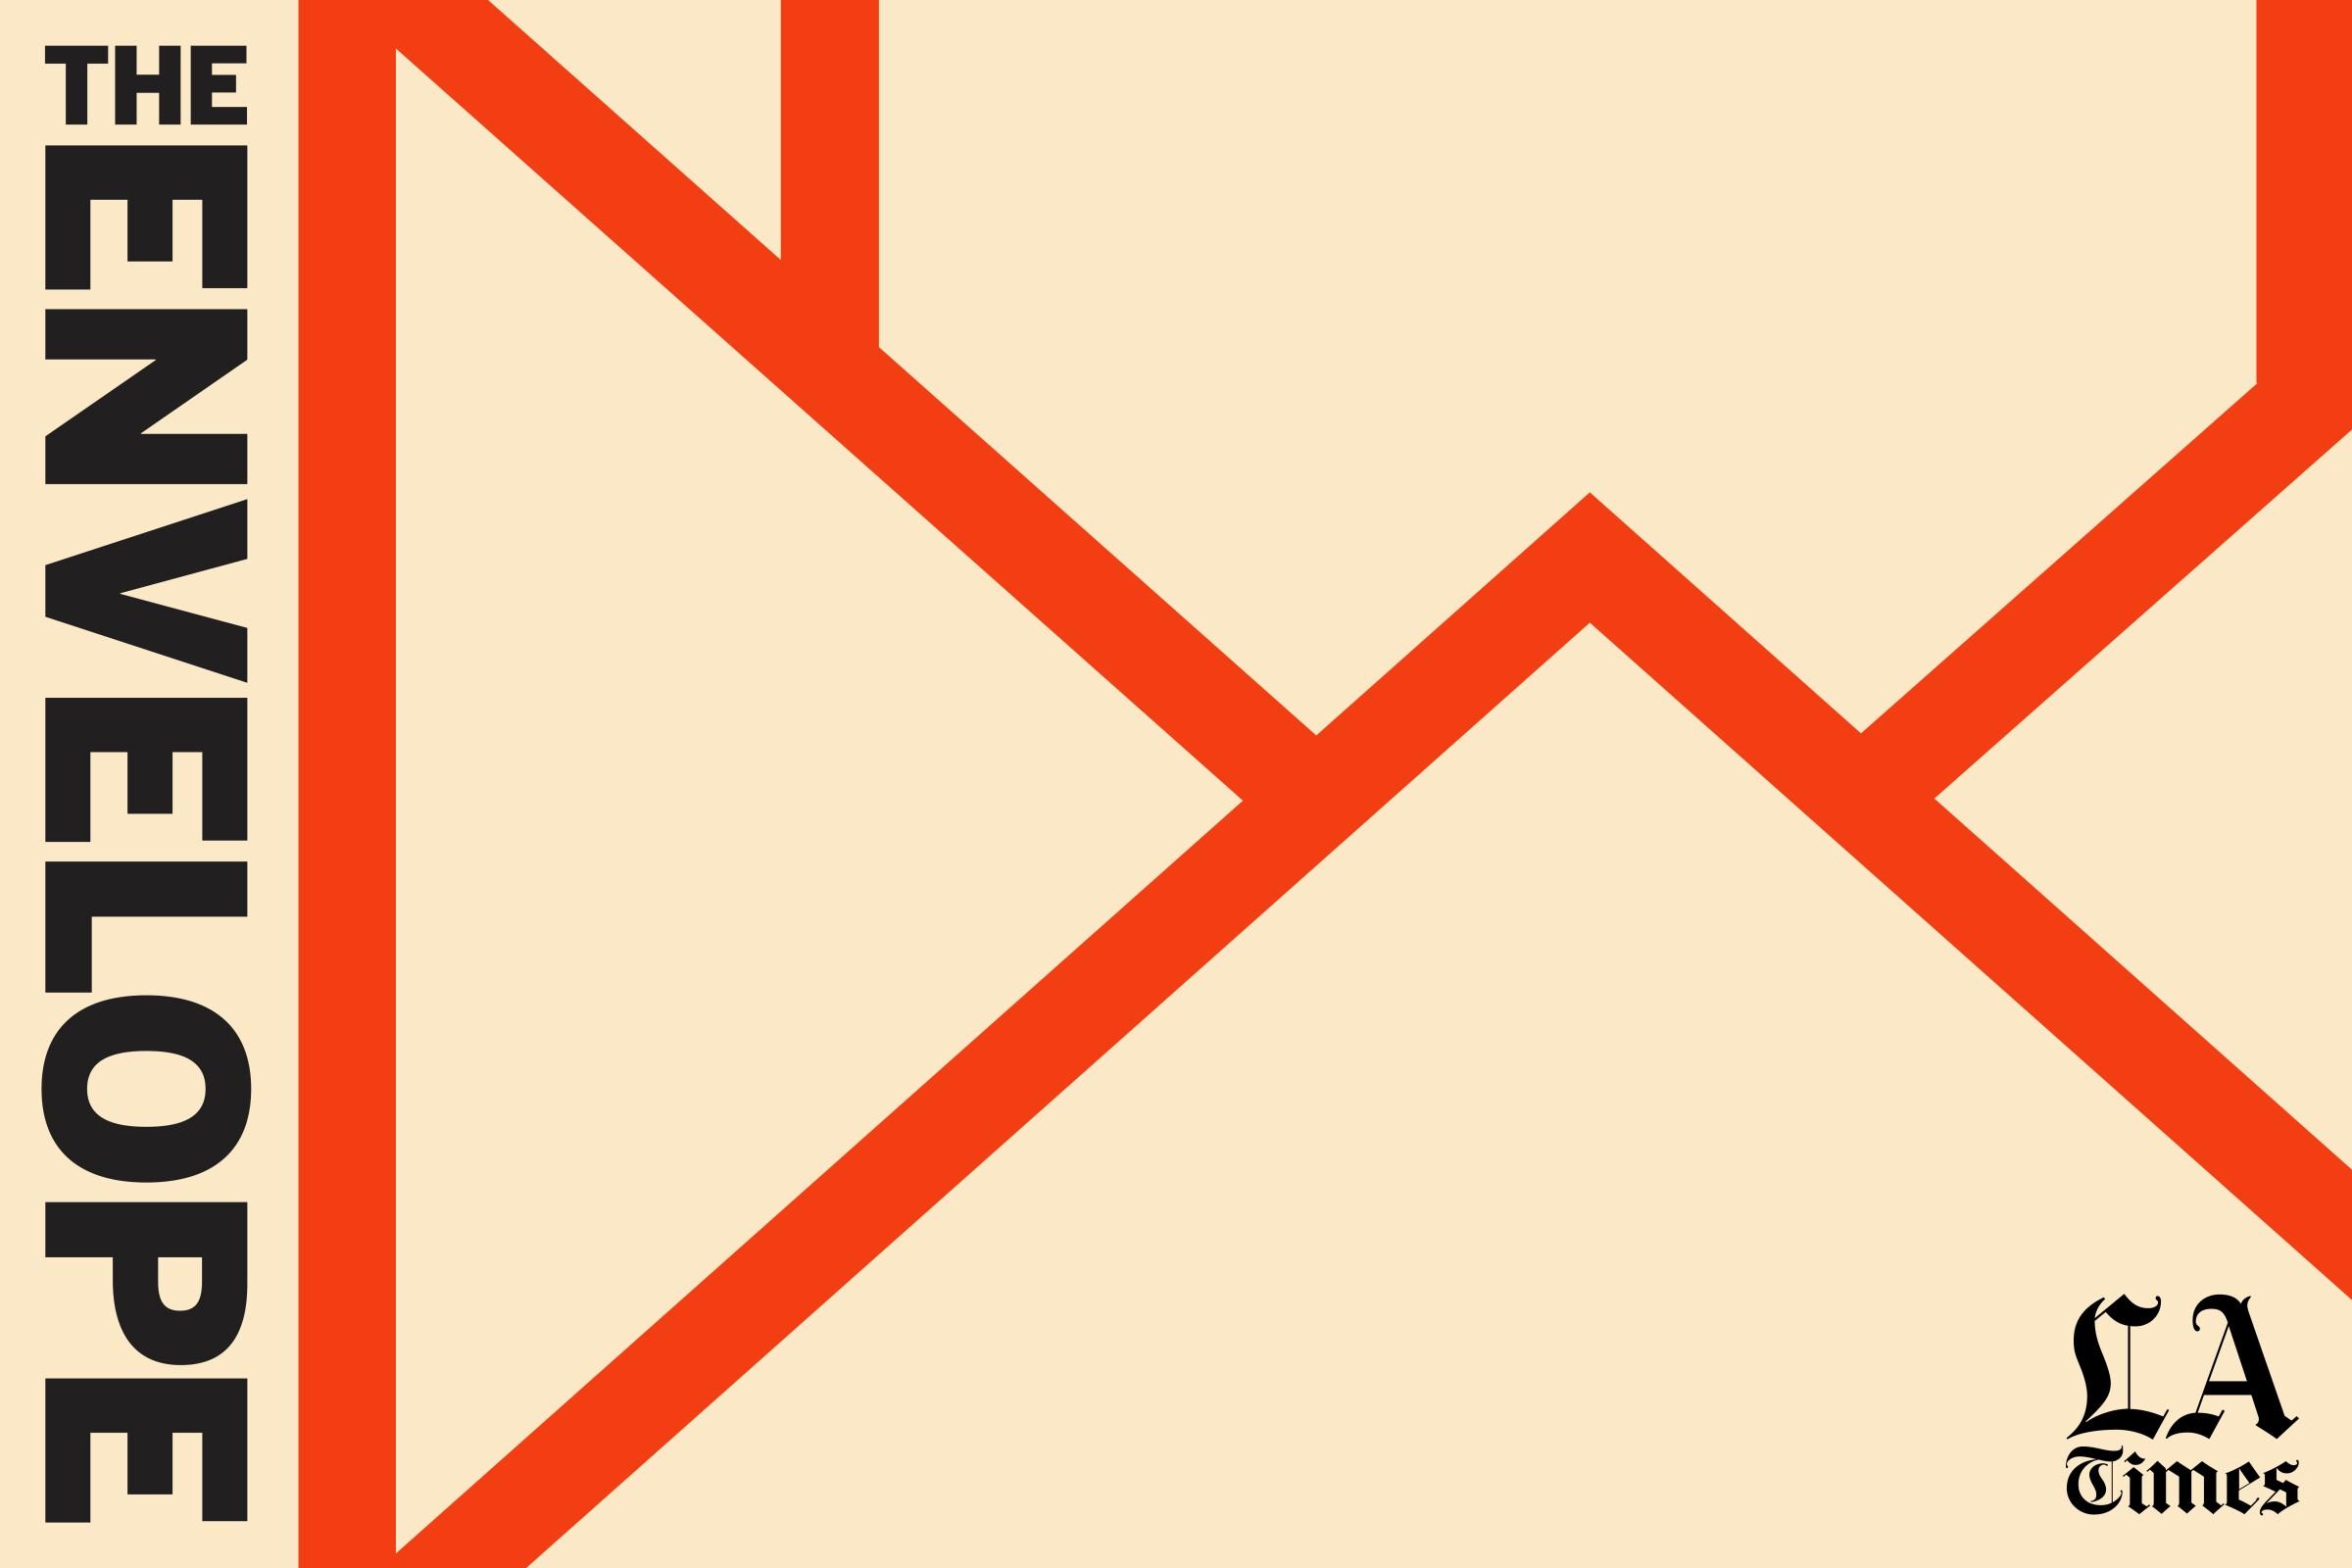 The Envelope illustration